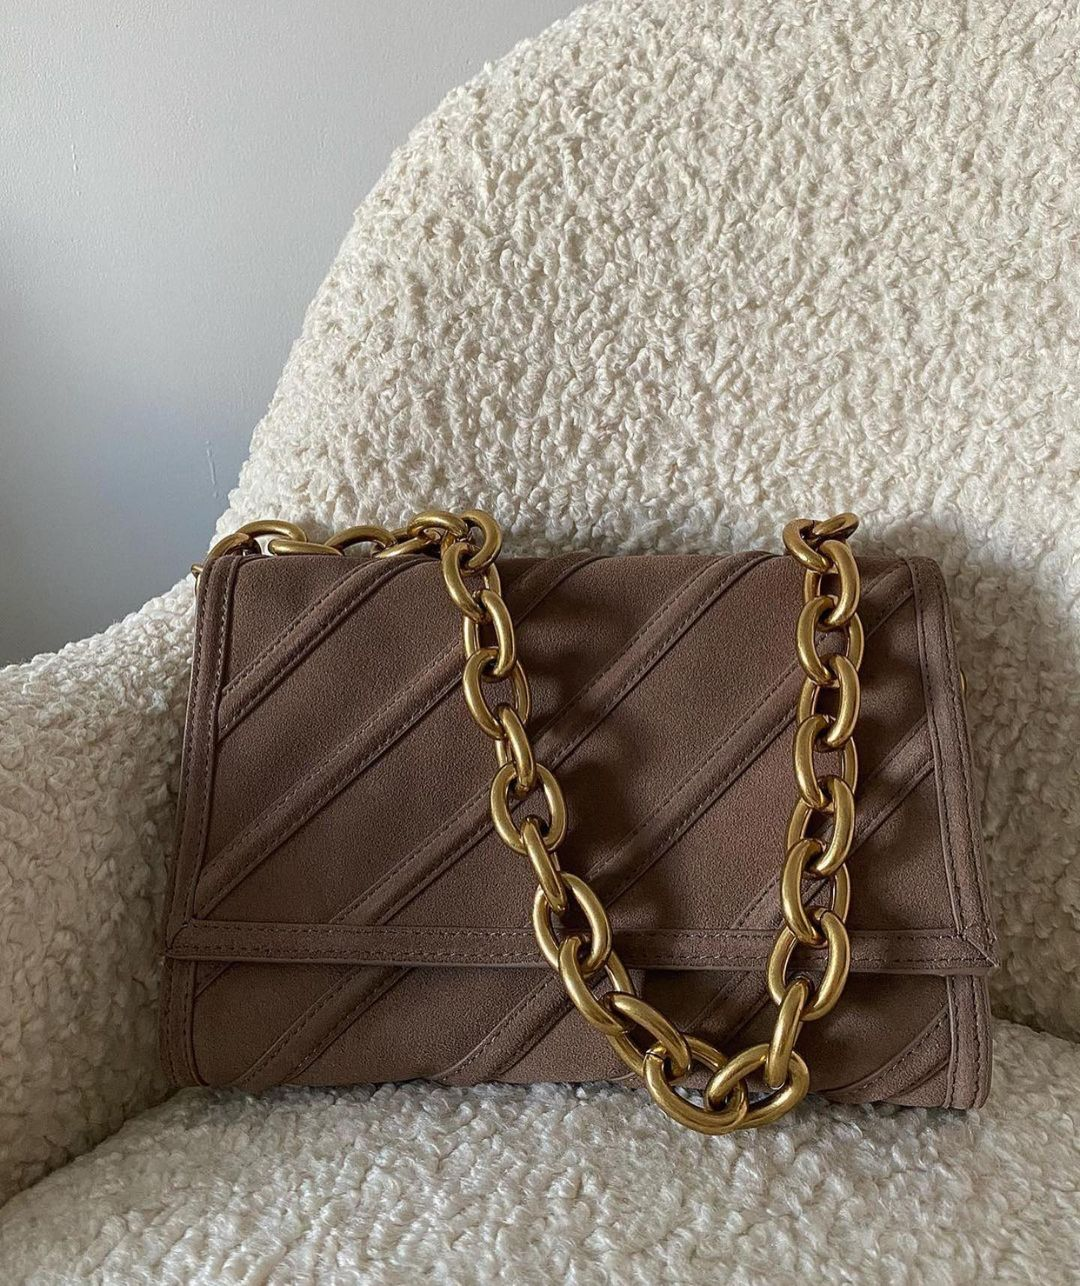 leather crust shoulder bag with chain de Zara sur zaraaddiction